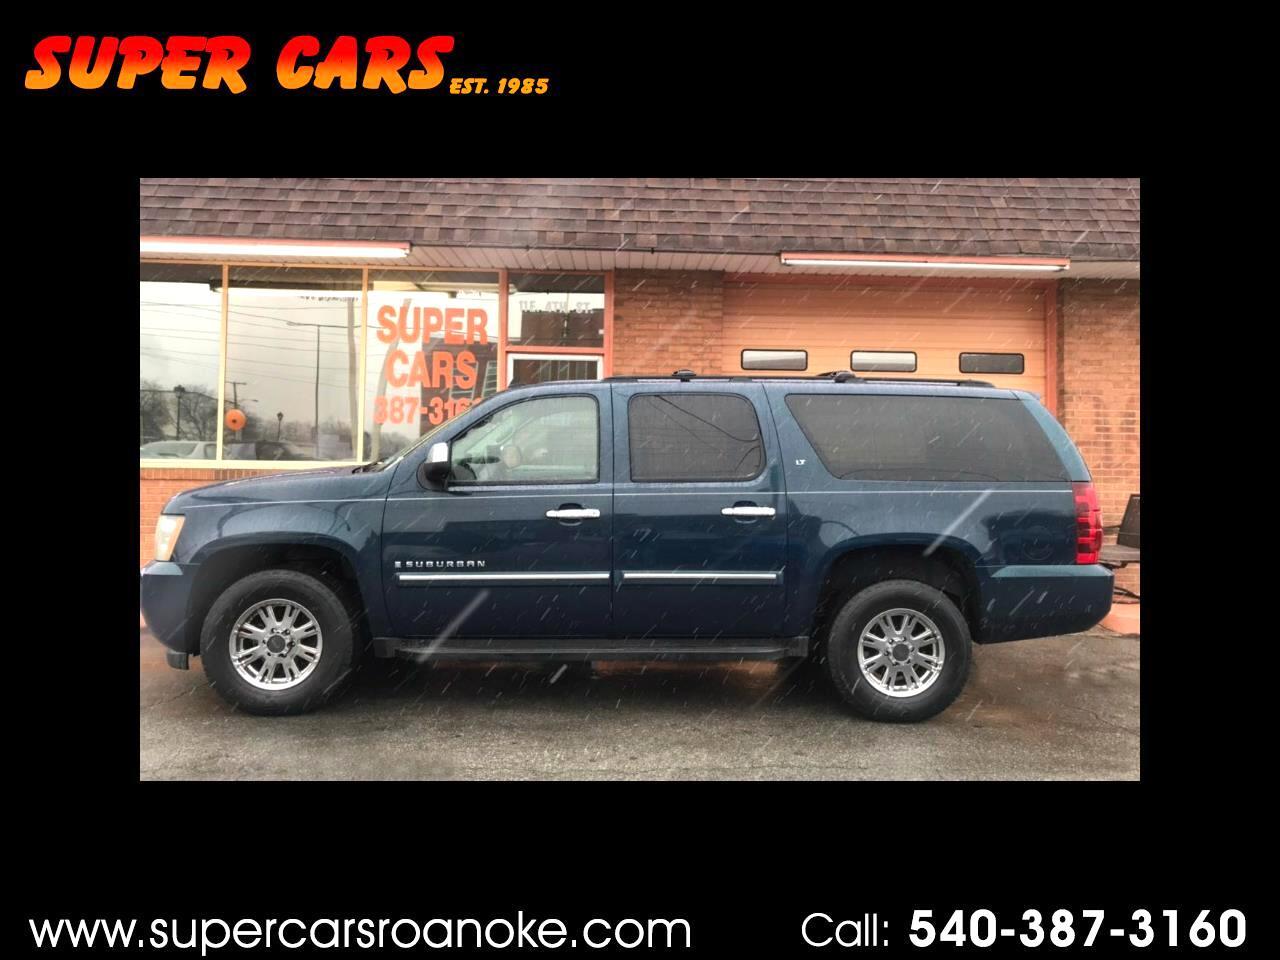 2007 Chevrolet Suburban LT2 1500 4WD